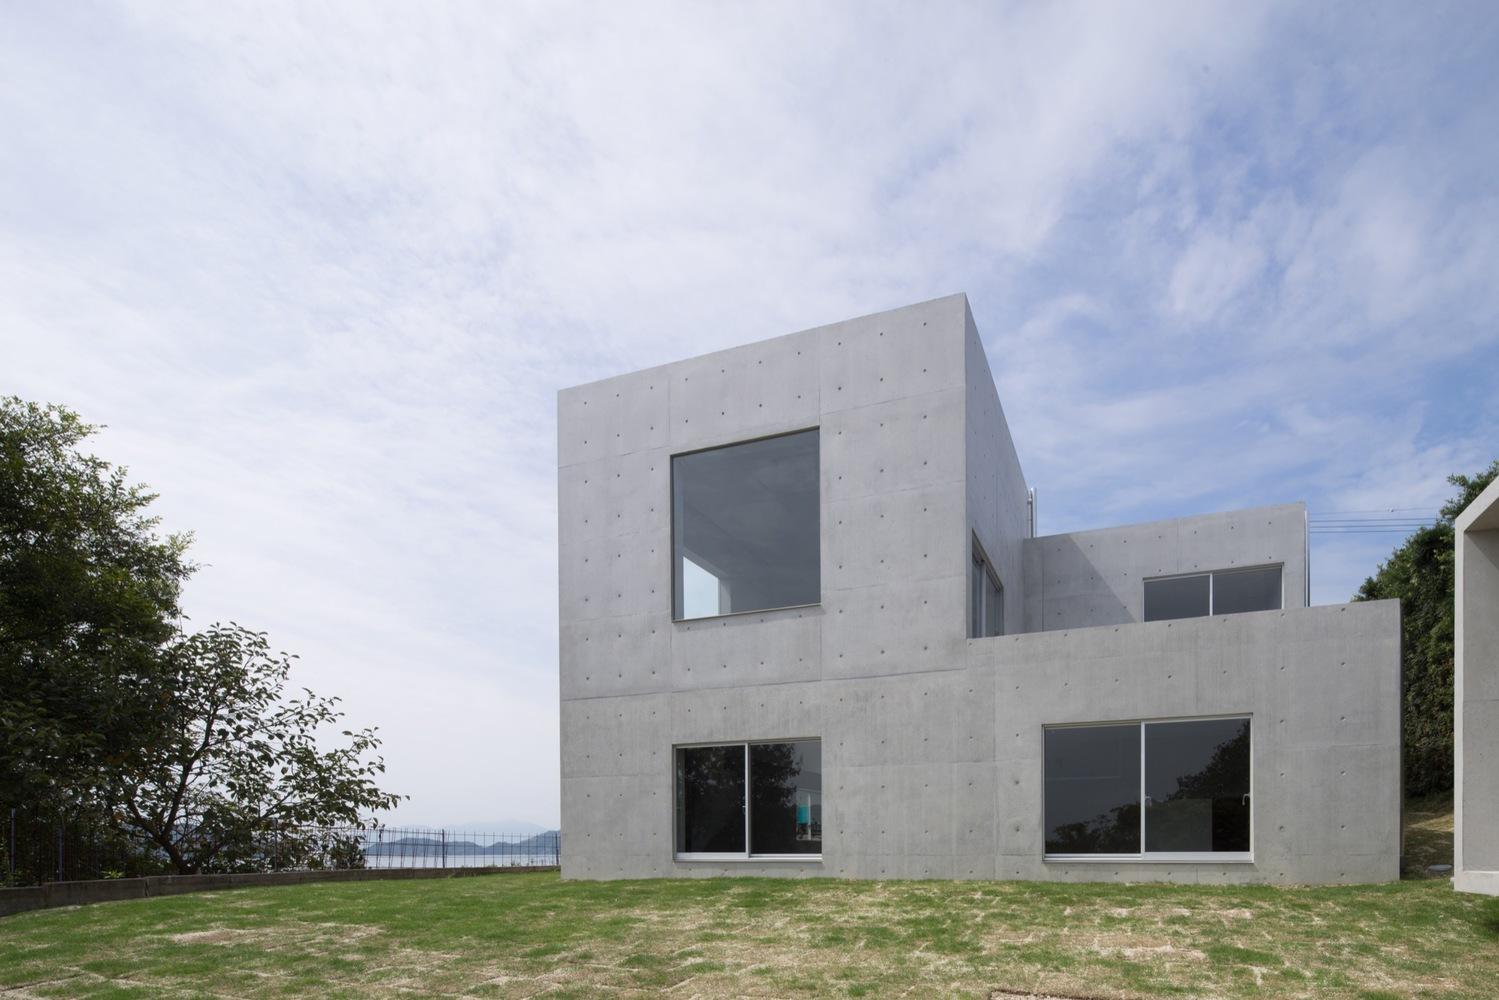 3_house-in-akitsu_kazunori-fujimoto-architectassociates_inspirationist